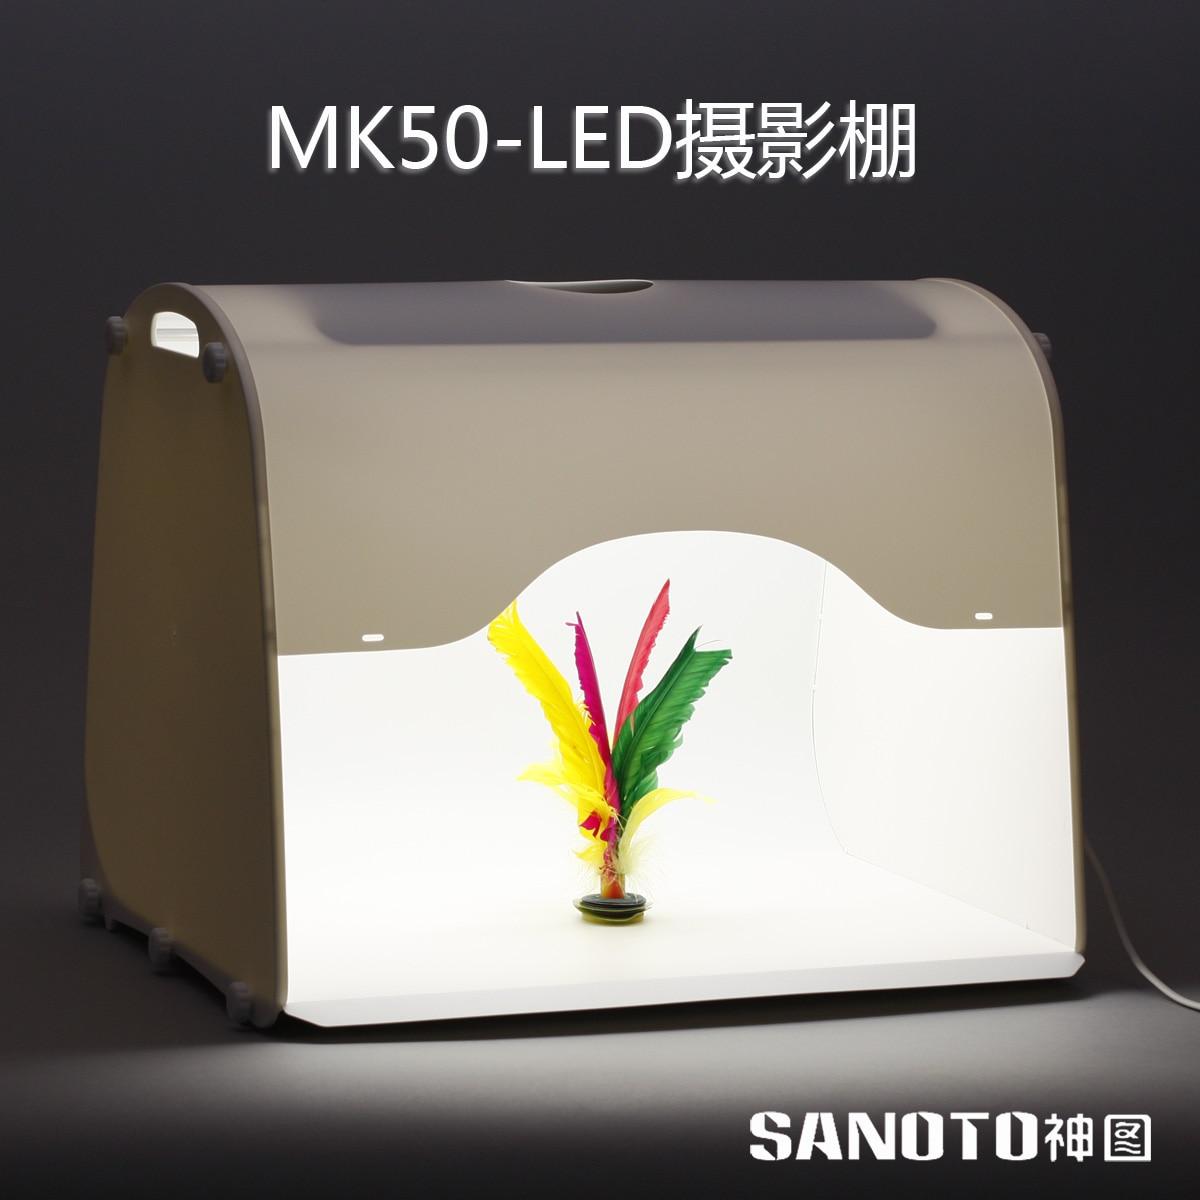 Adearstudio studio box  Mk50 LED Studio Kit Softbox Photographing Jewelry Box Camera Light BOX CD50